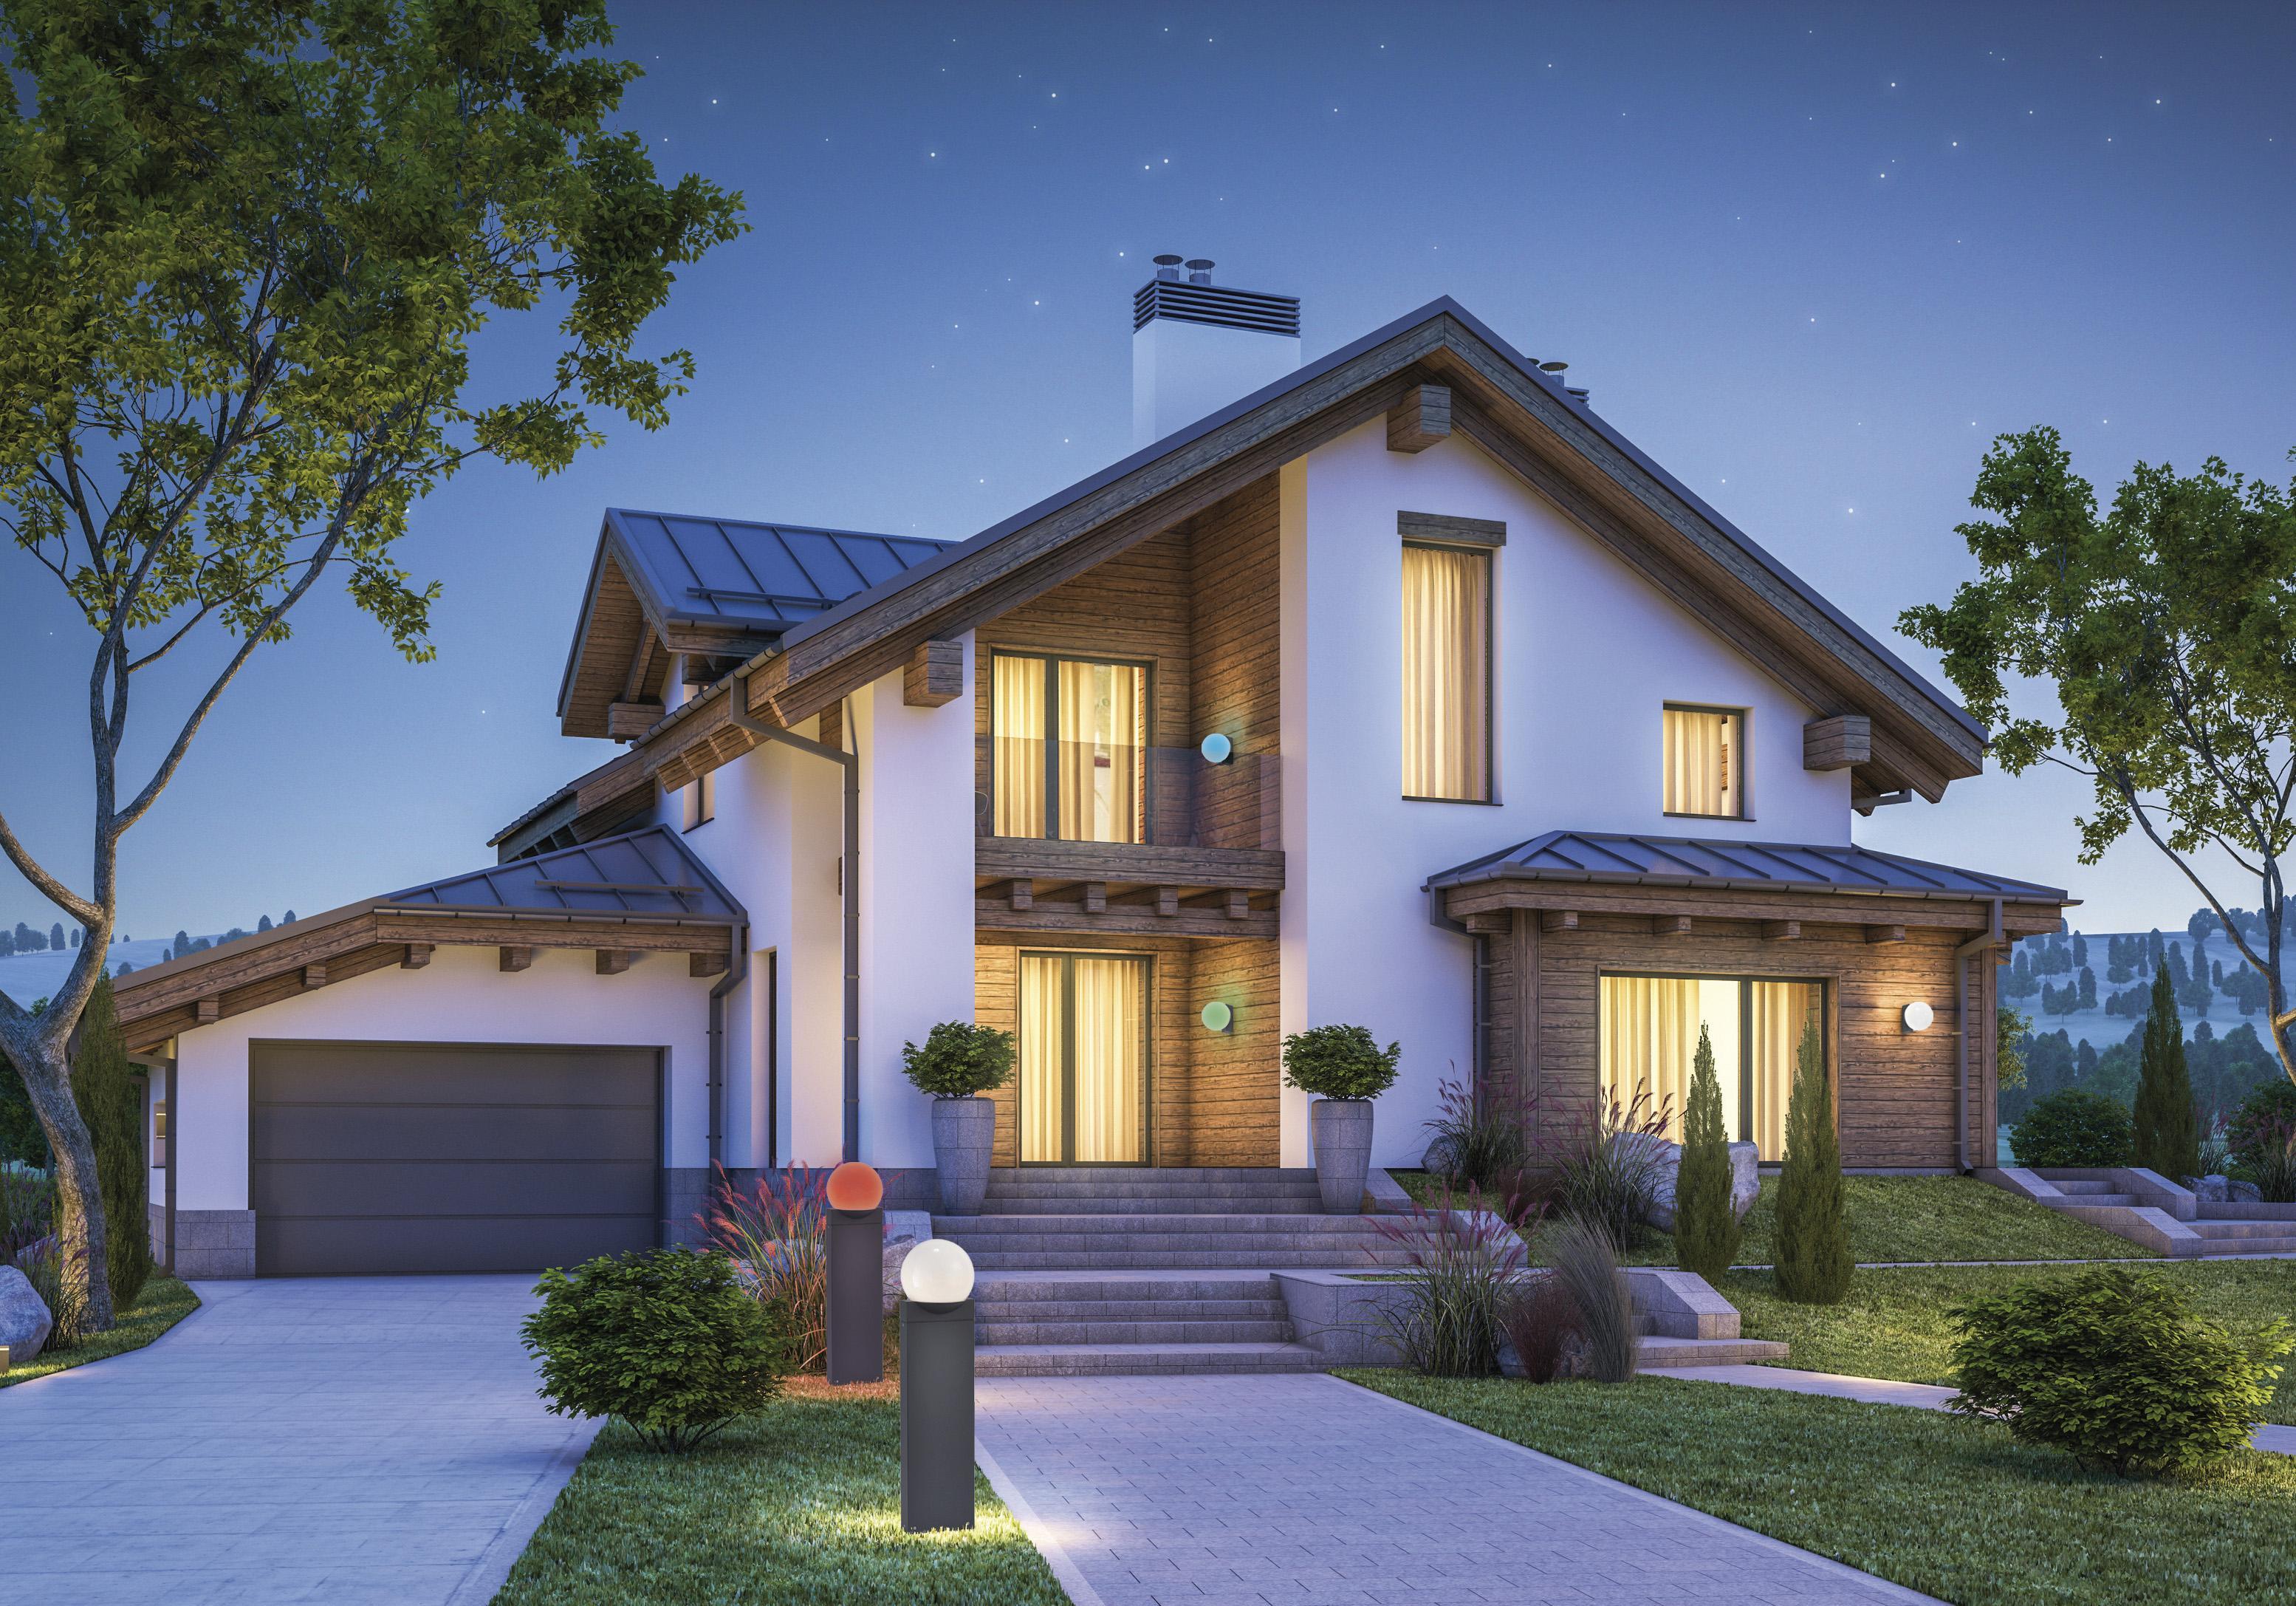 Smart Home - intelligente Heimvernetzung